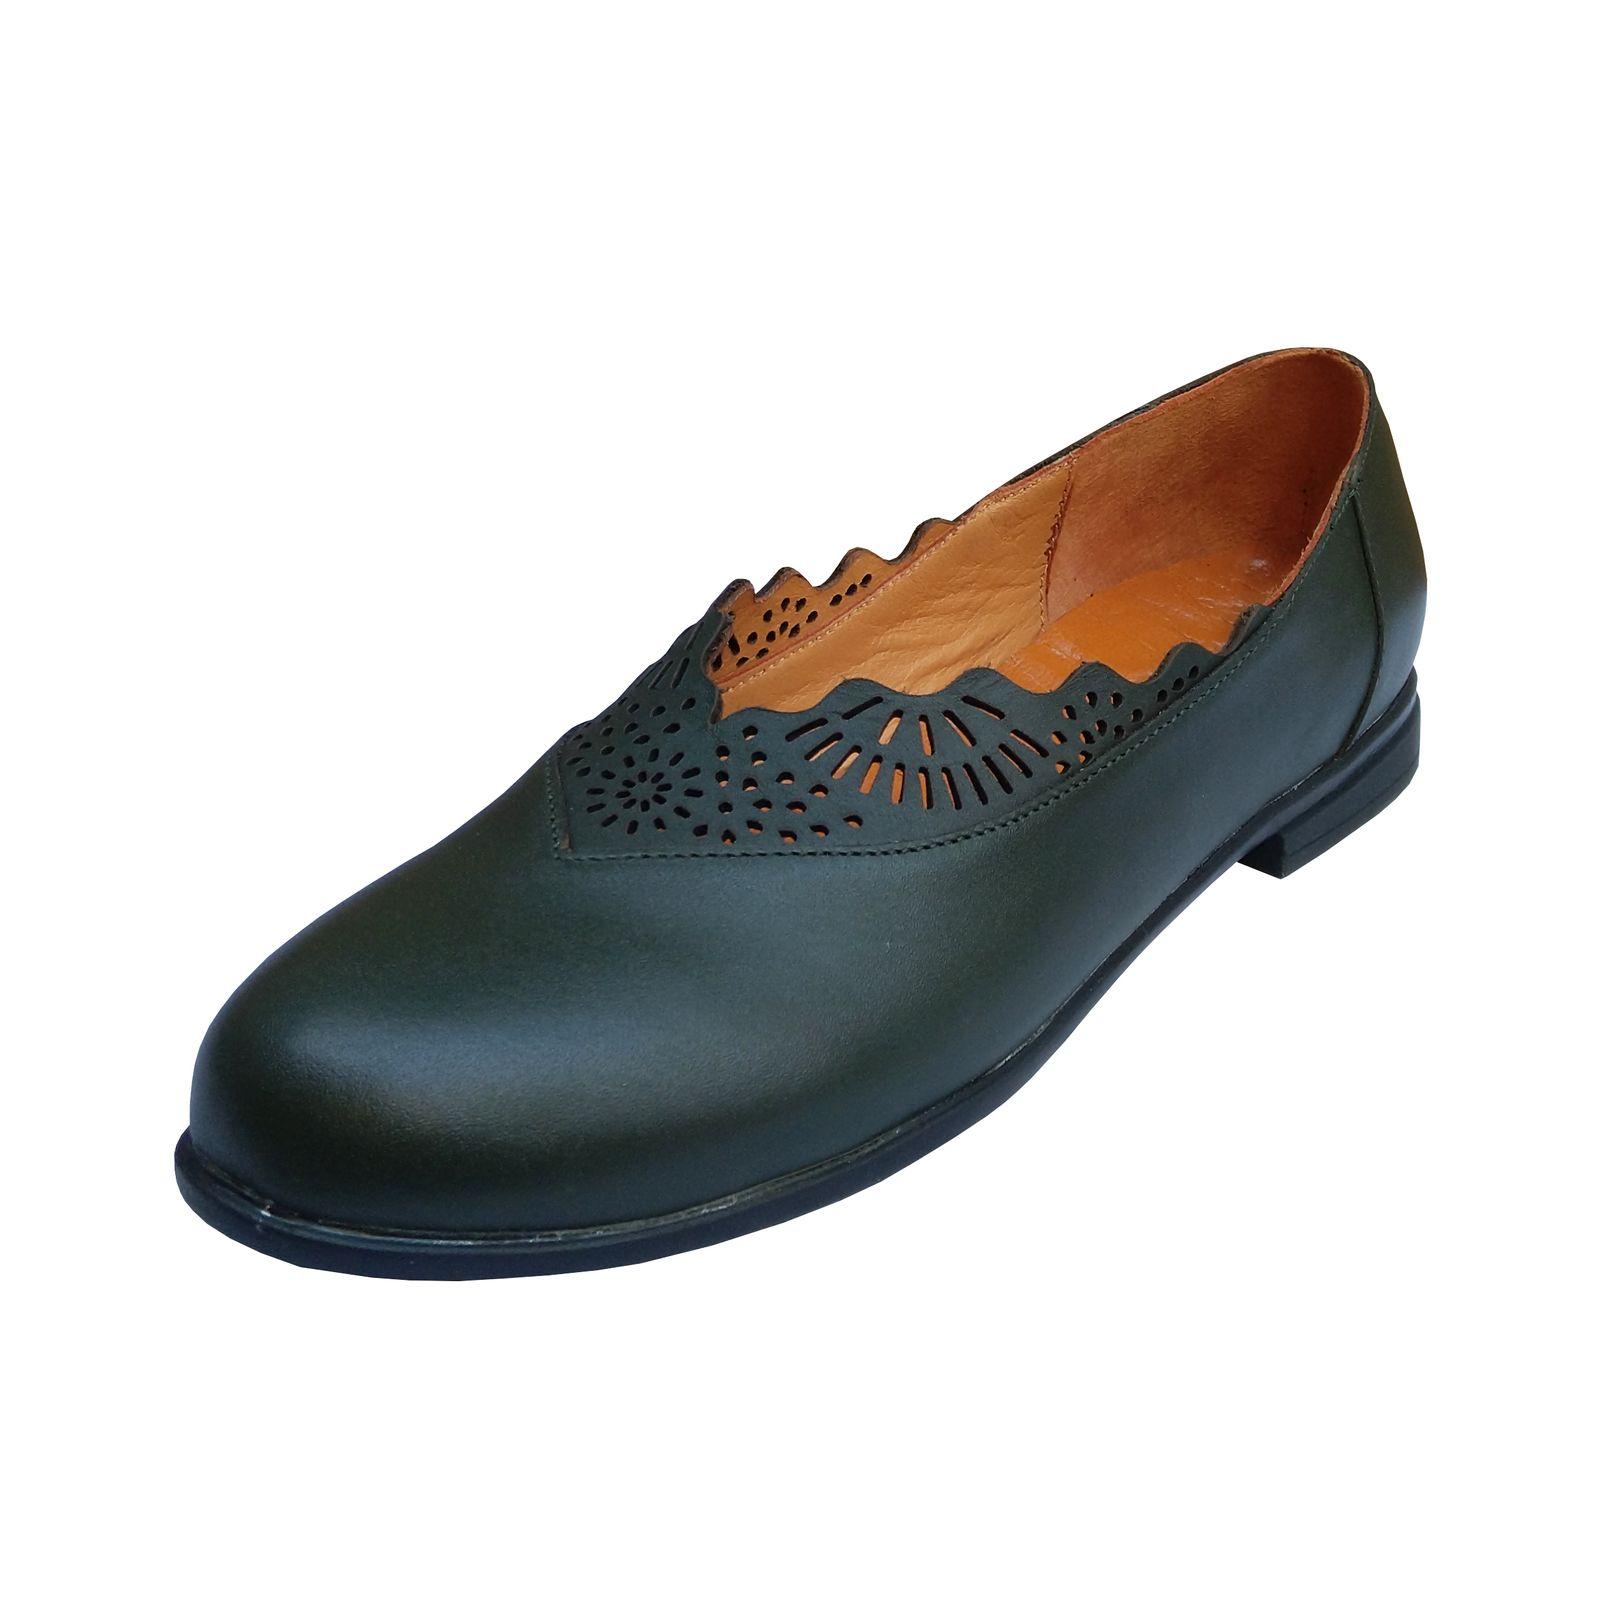 کفش زنانه مدل SK 308 -  - 6